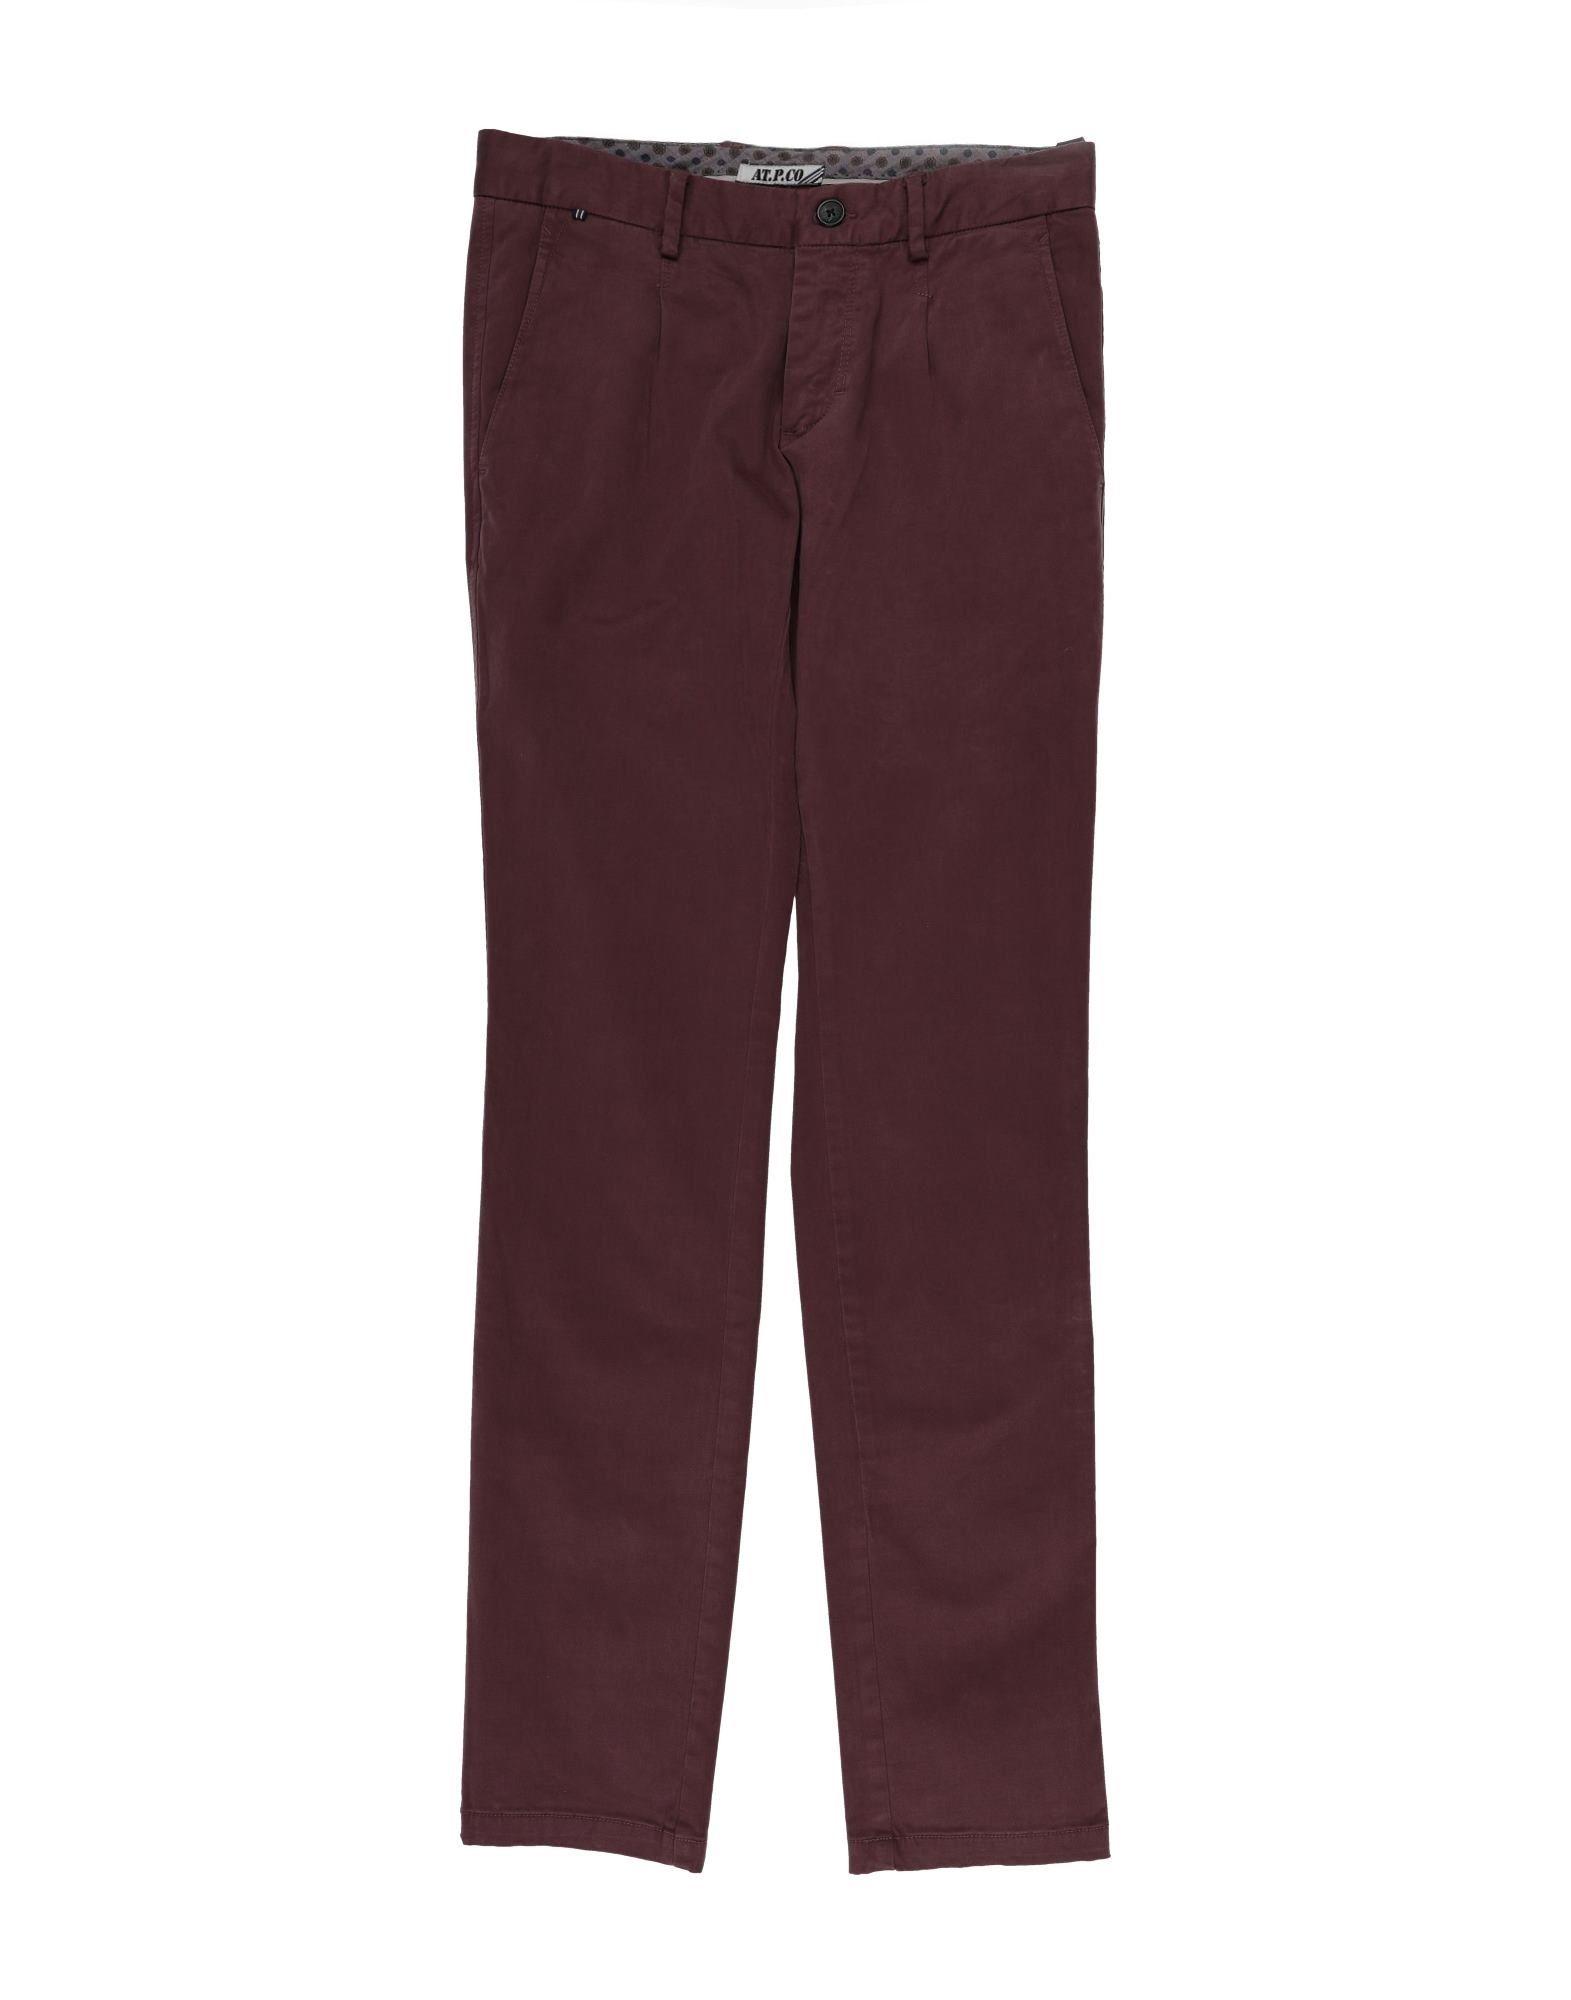 AT.P.CO Повседневные брюки брюки fmj брюки